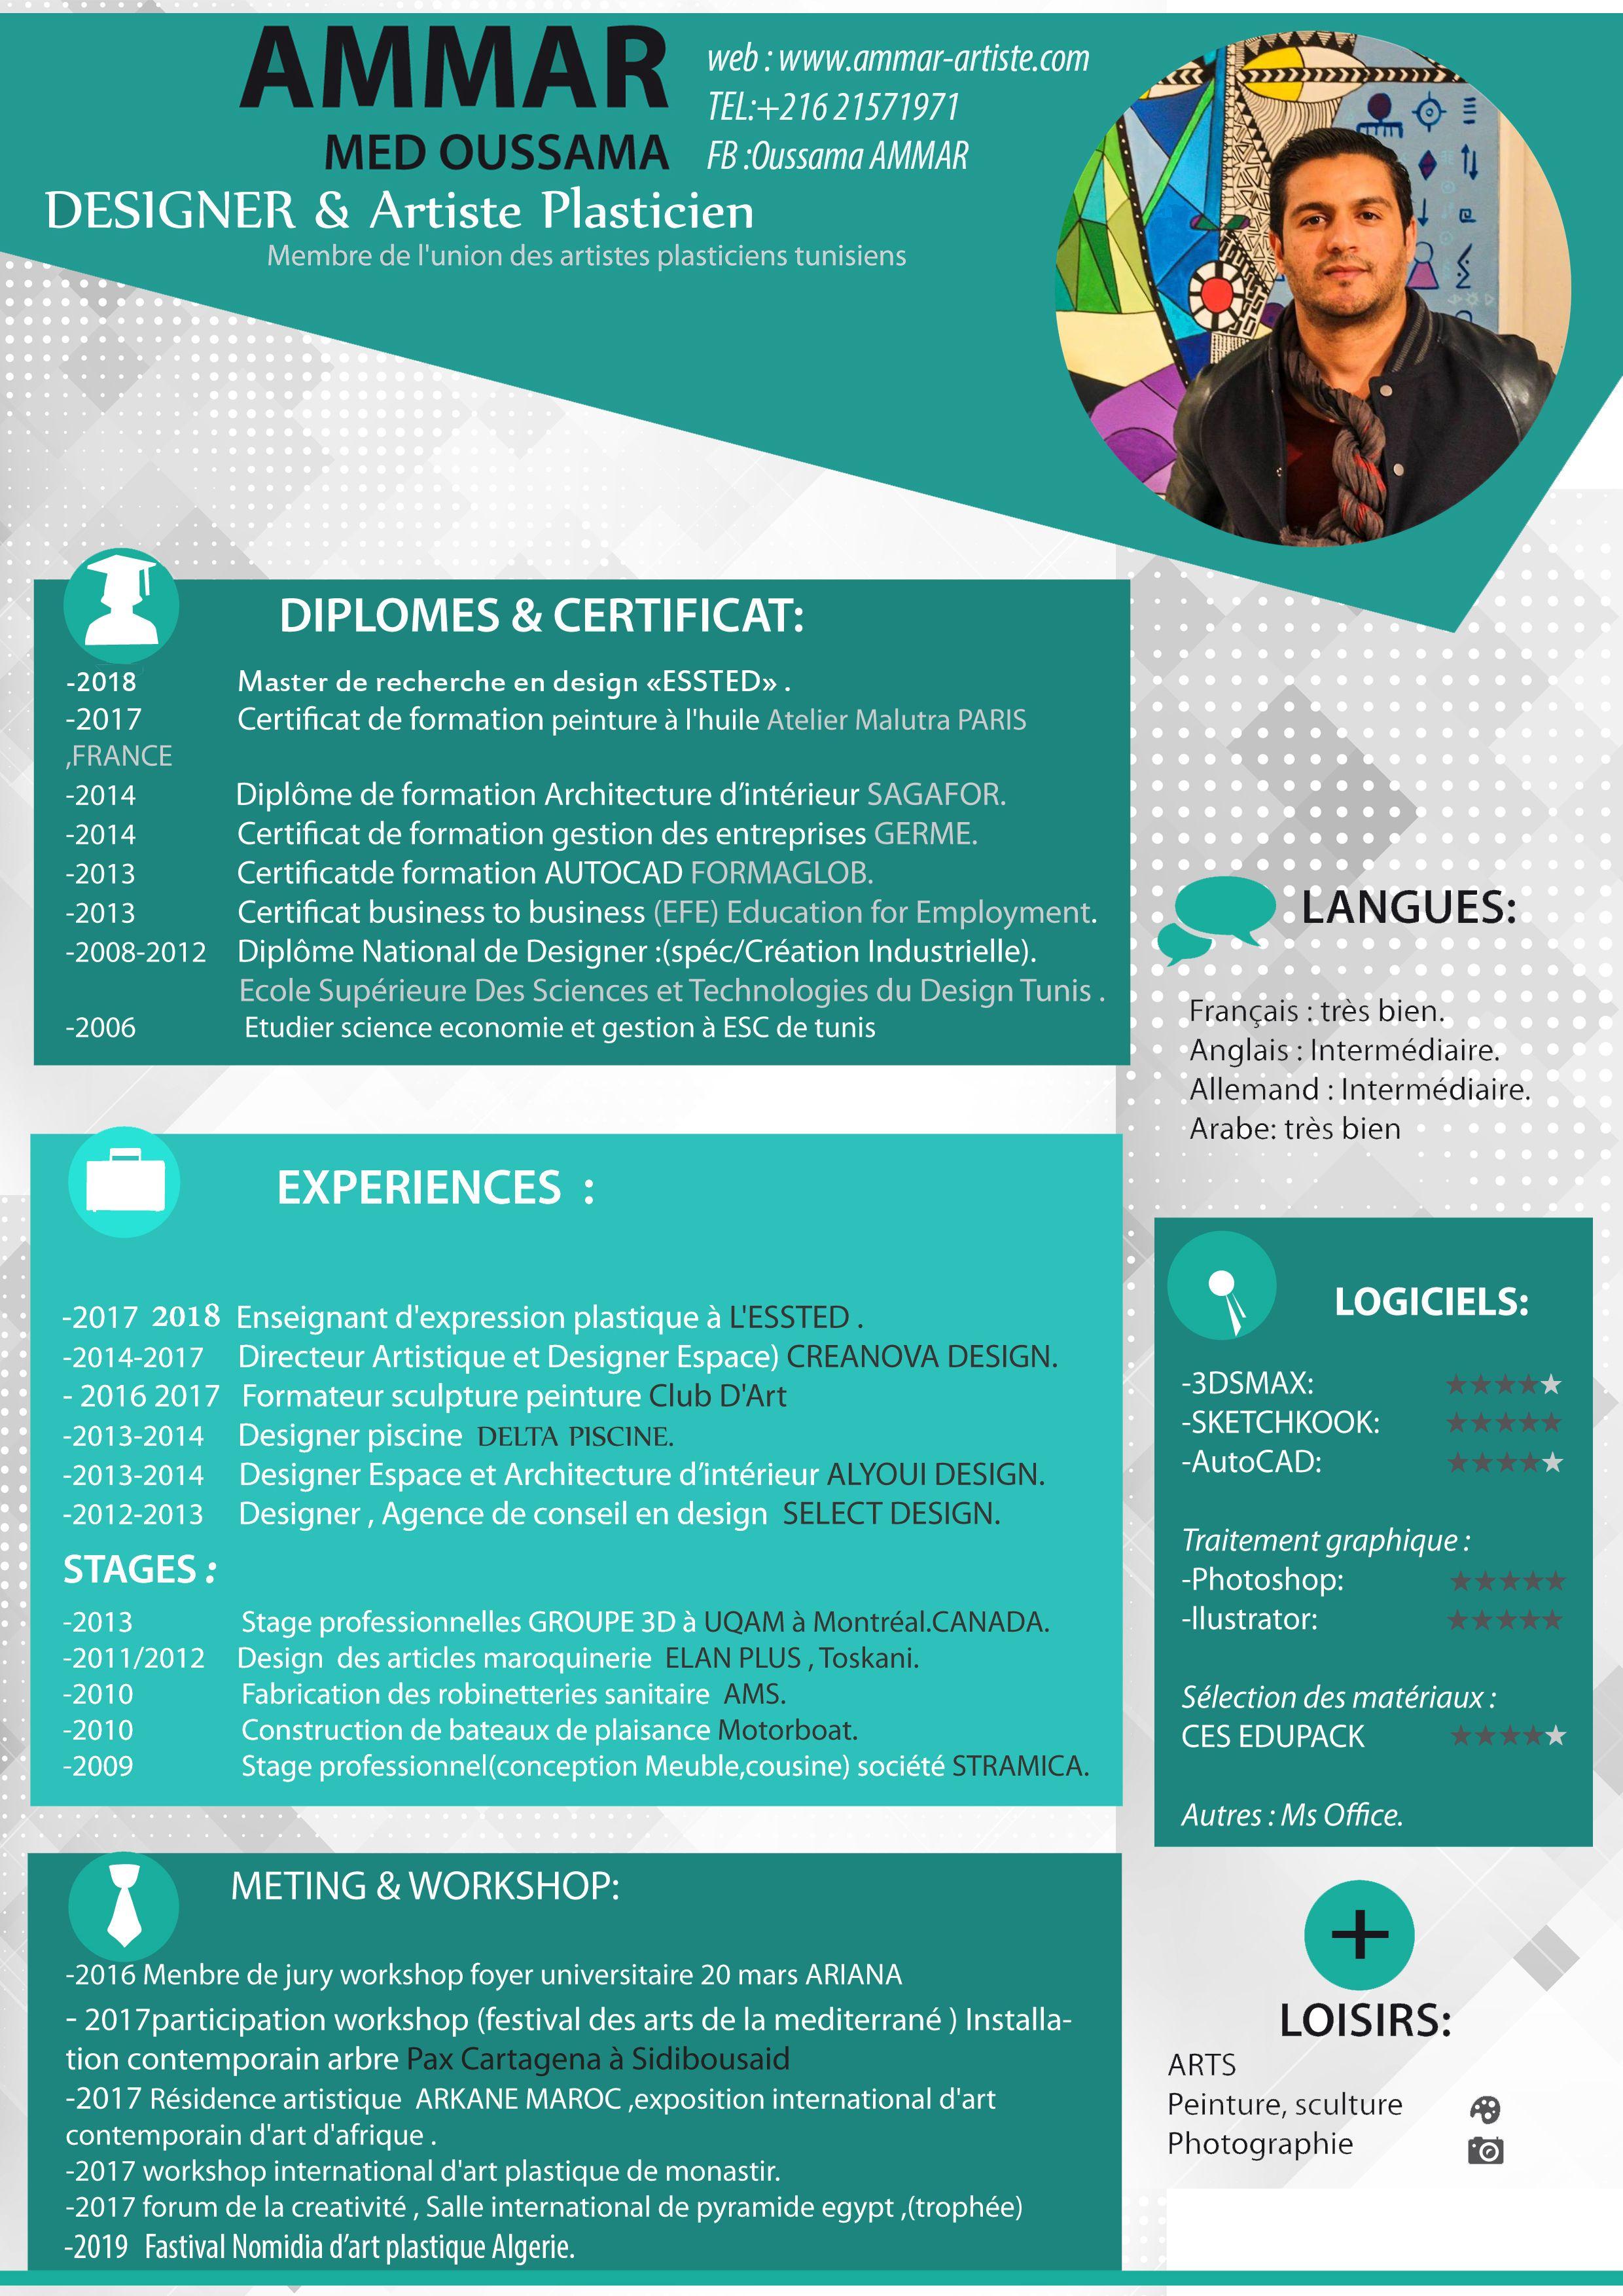 Cv Exemple Design Artist Tunisia